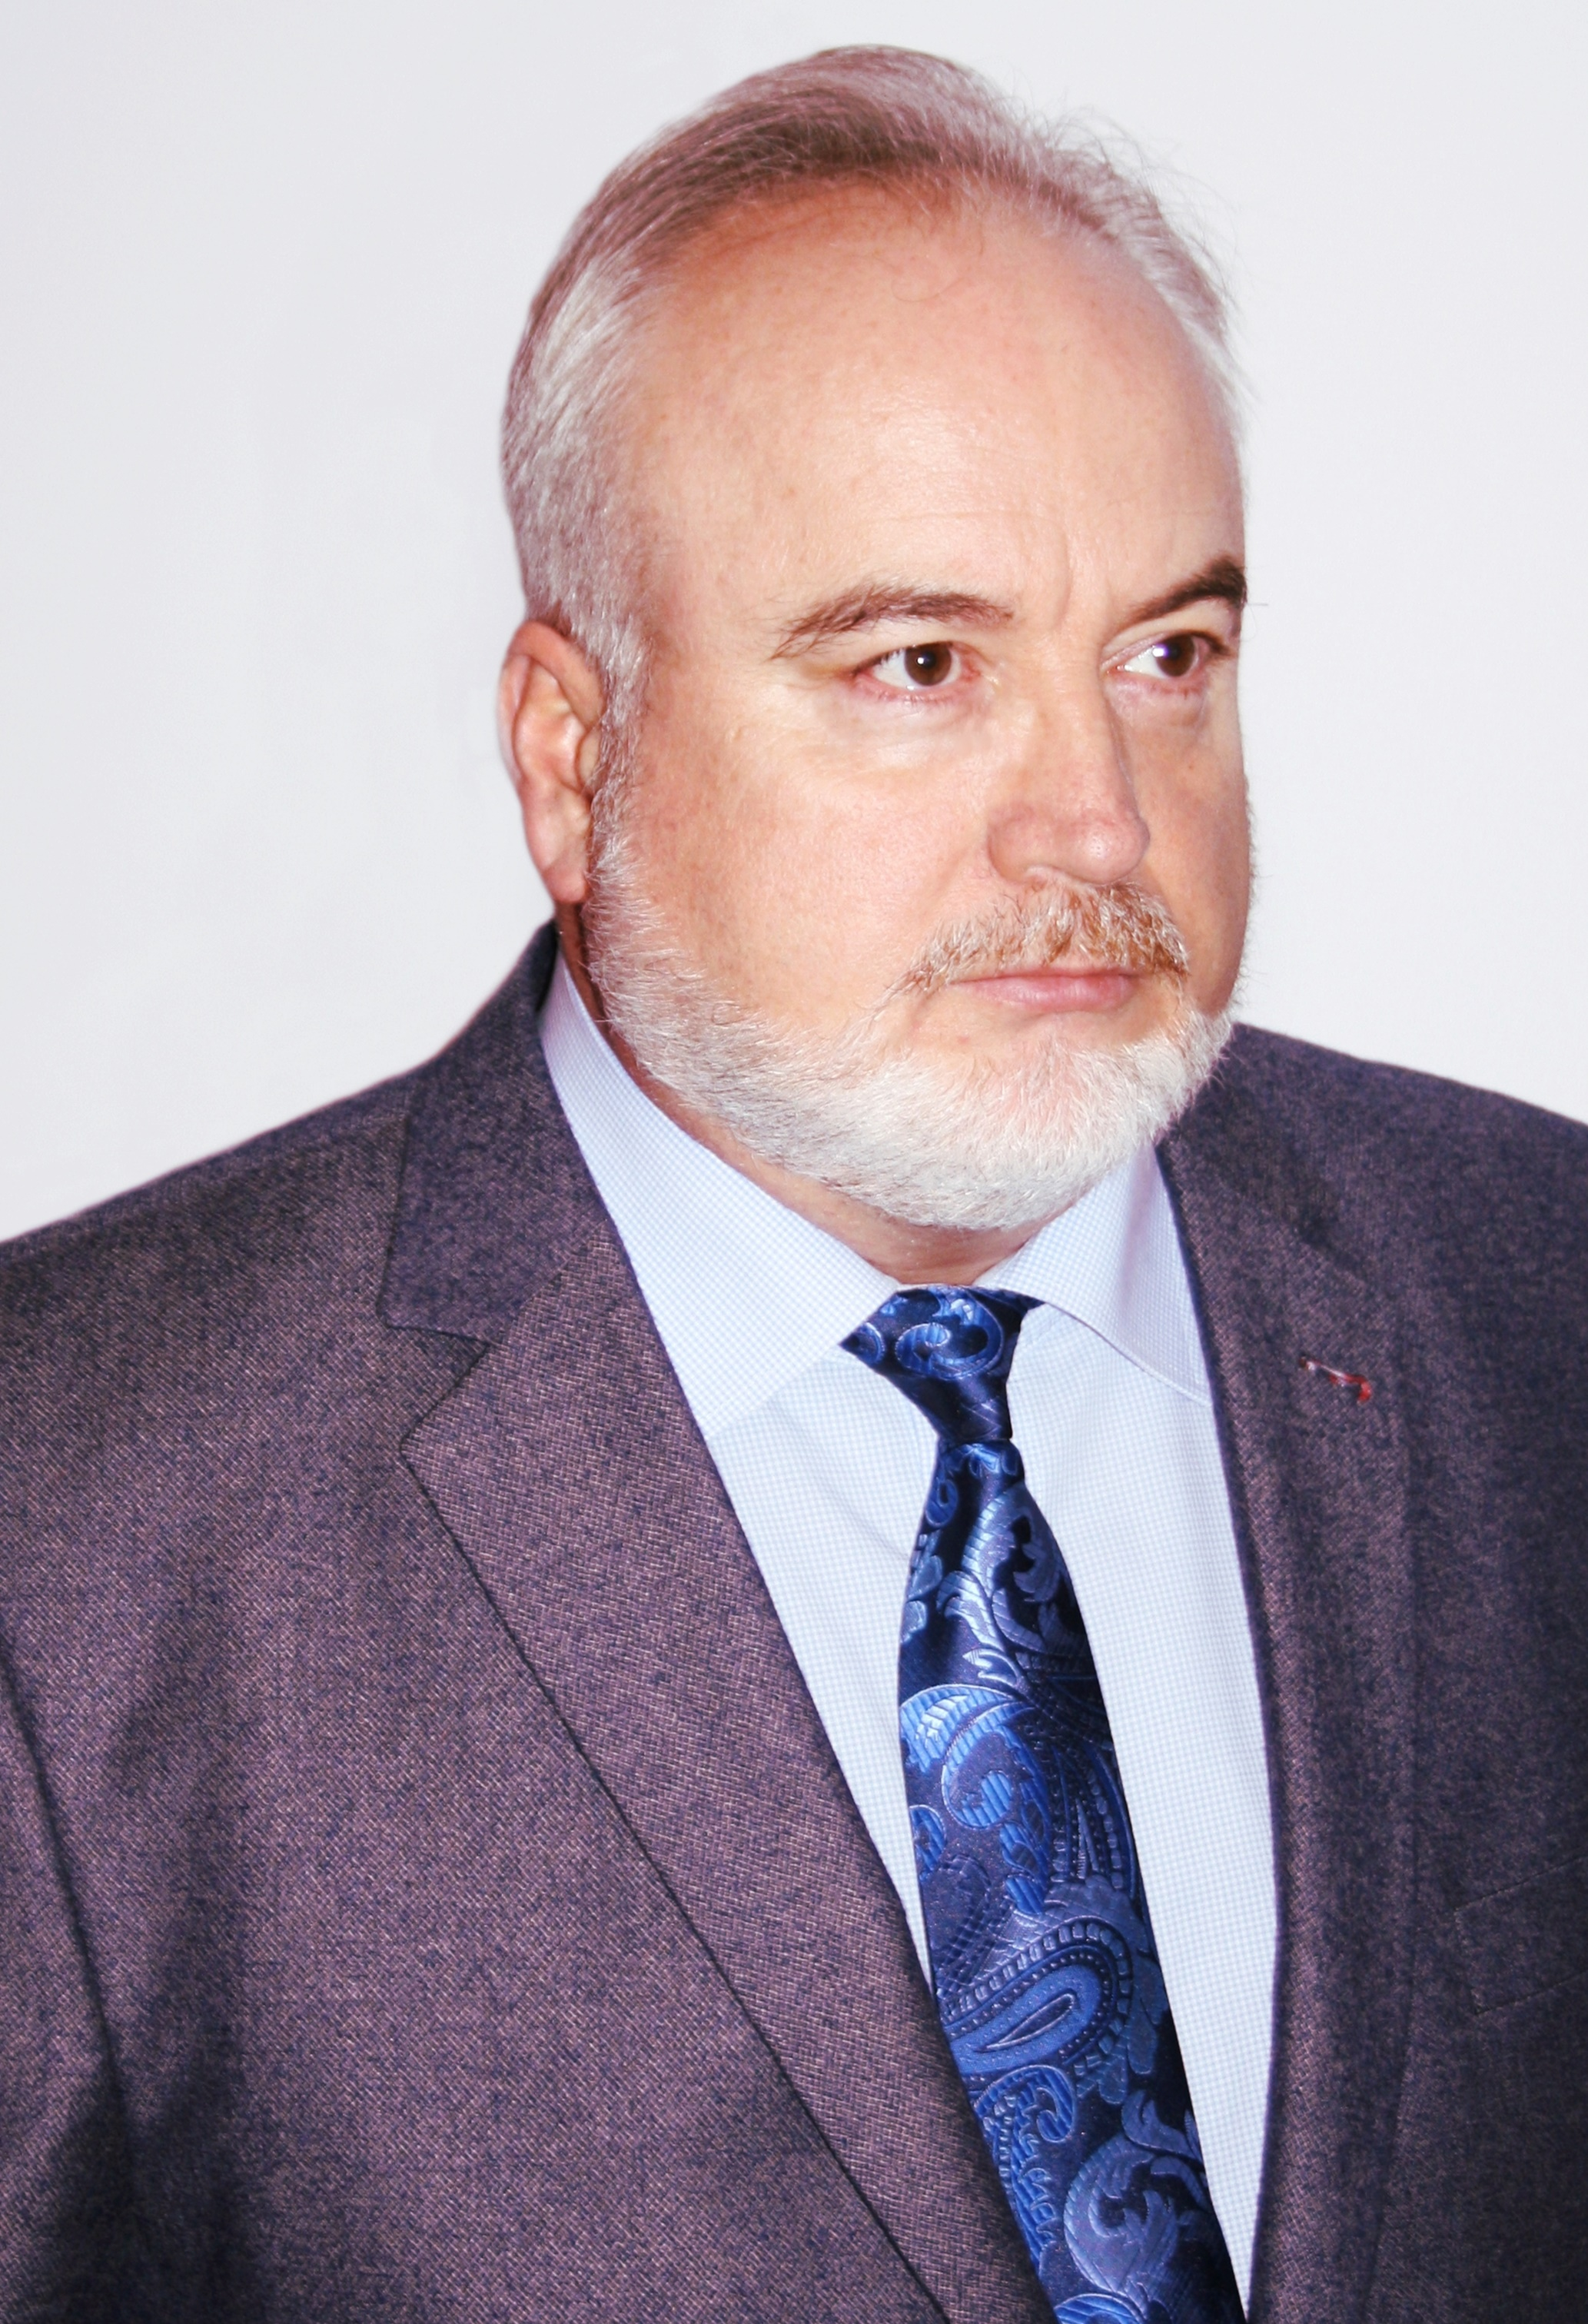 Dumitru Grigore